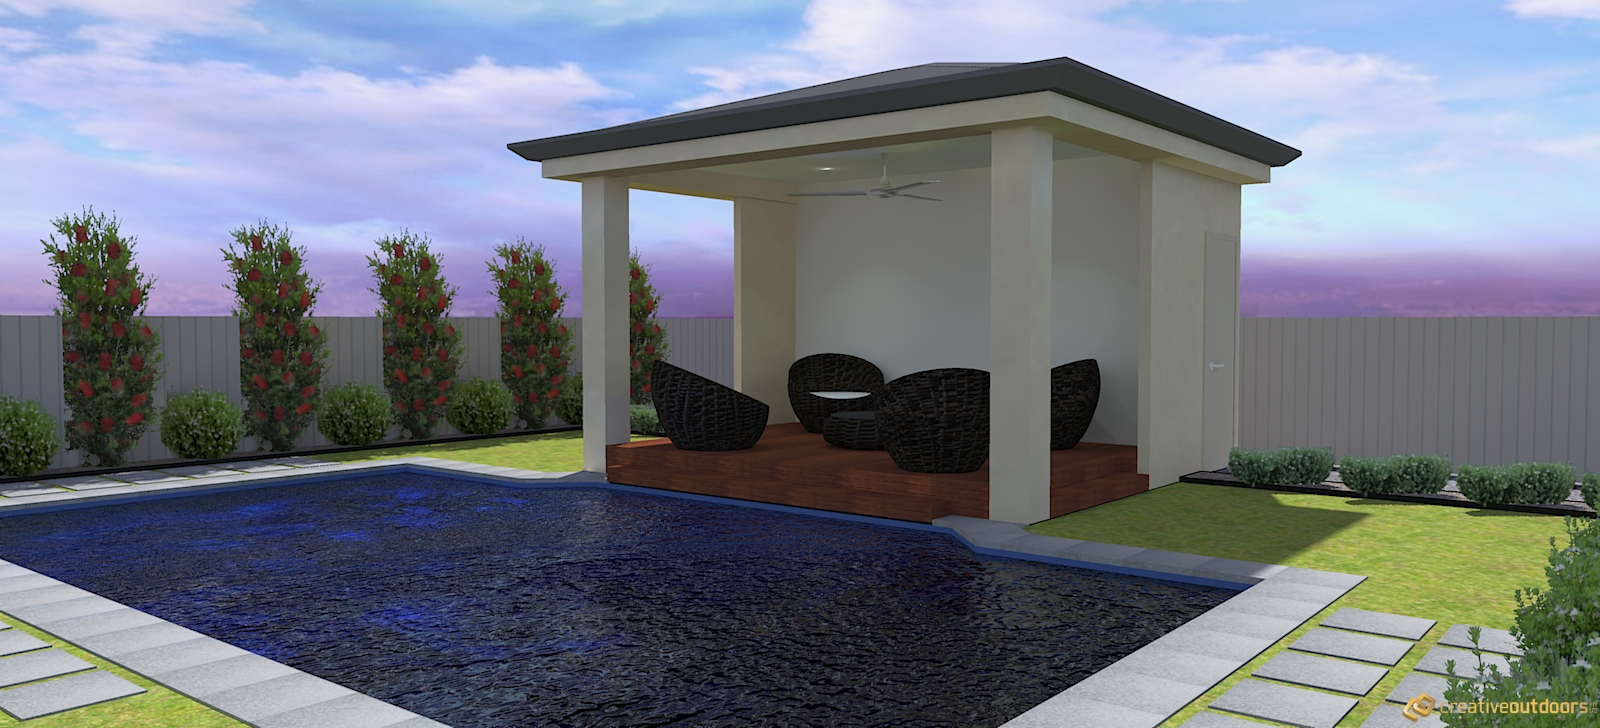 Creative-Outdoors-Outdoor-Concept-Custom-Design-006